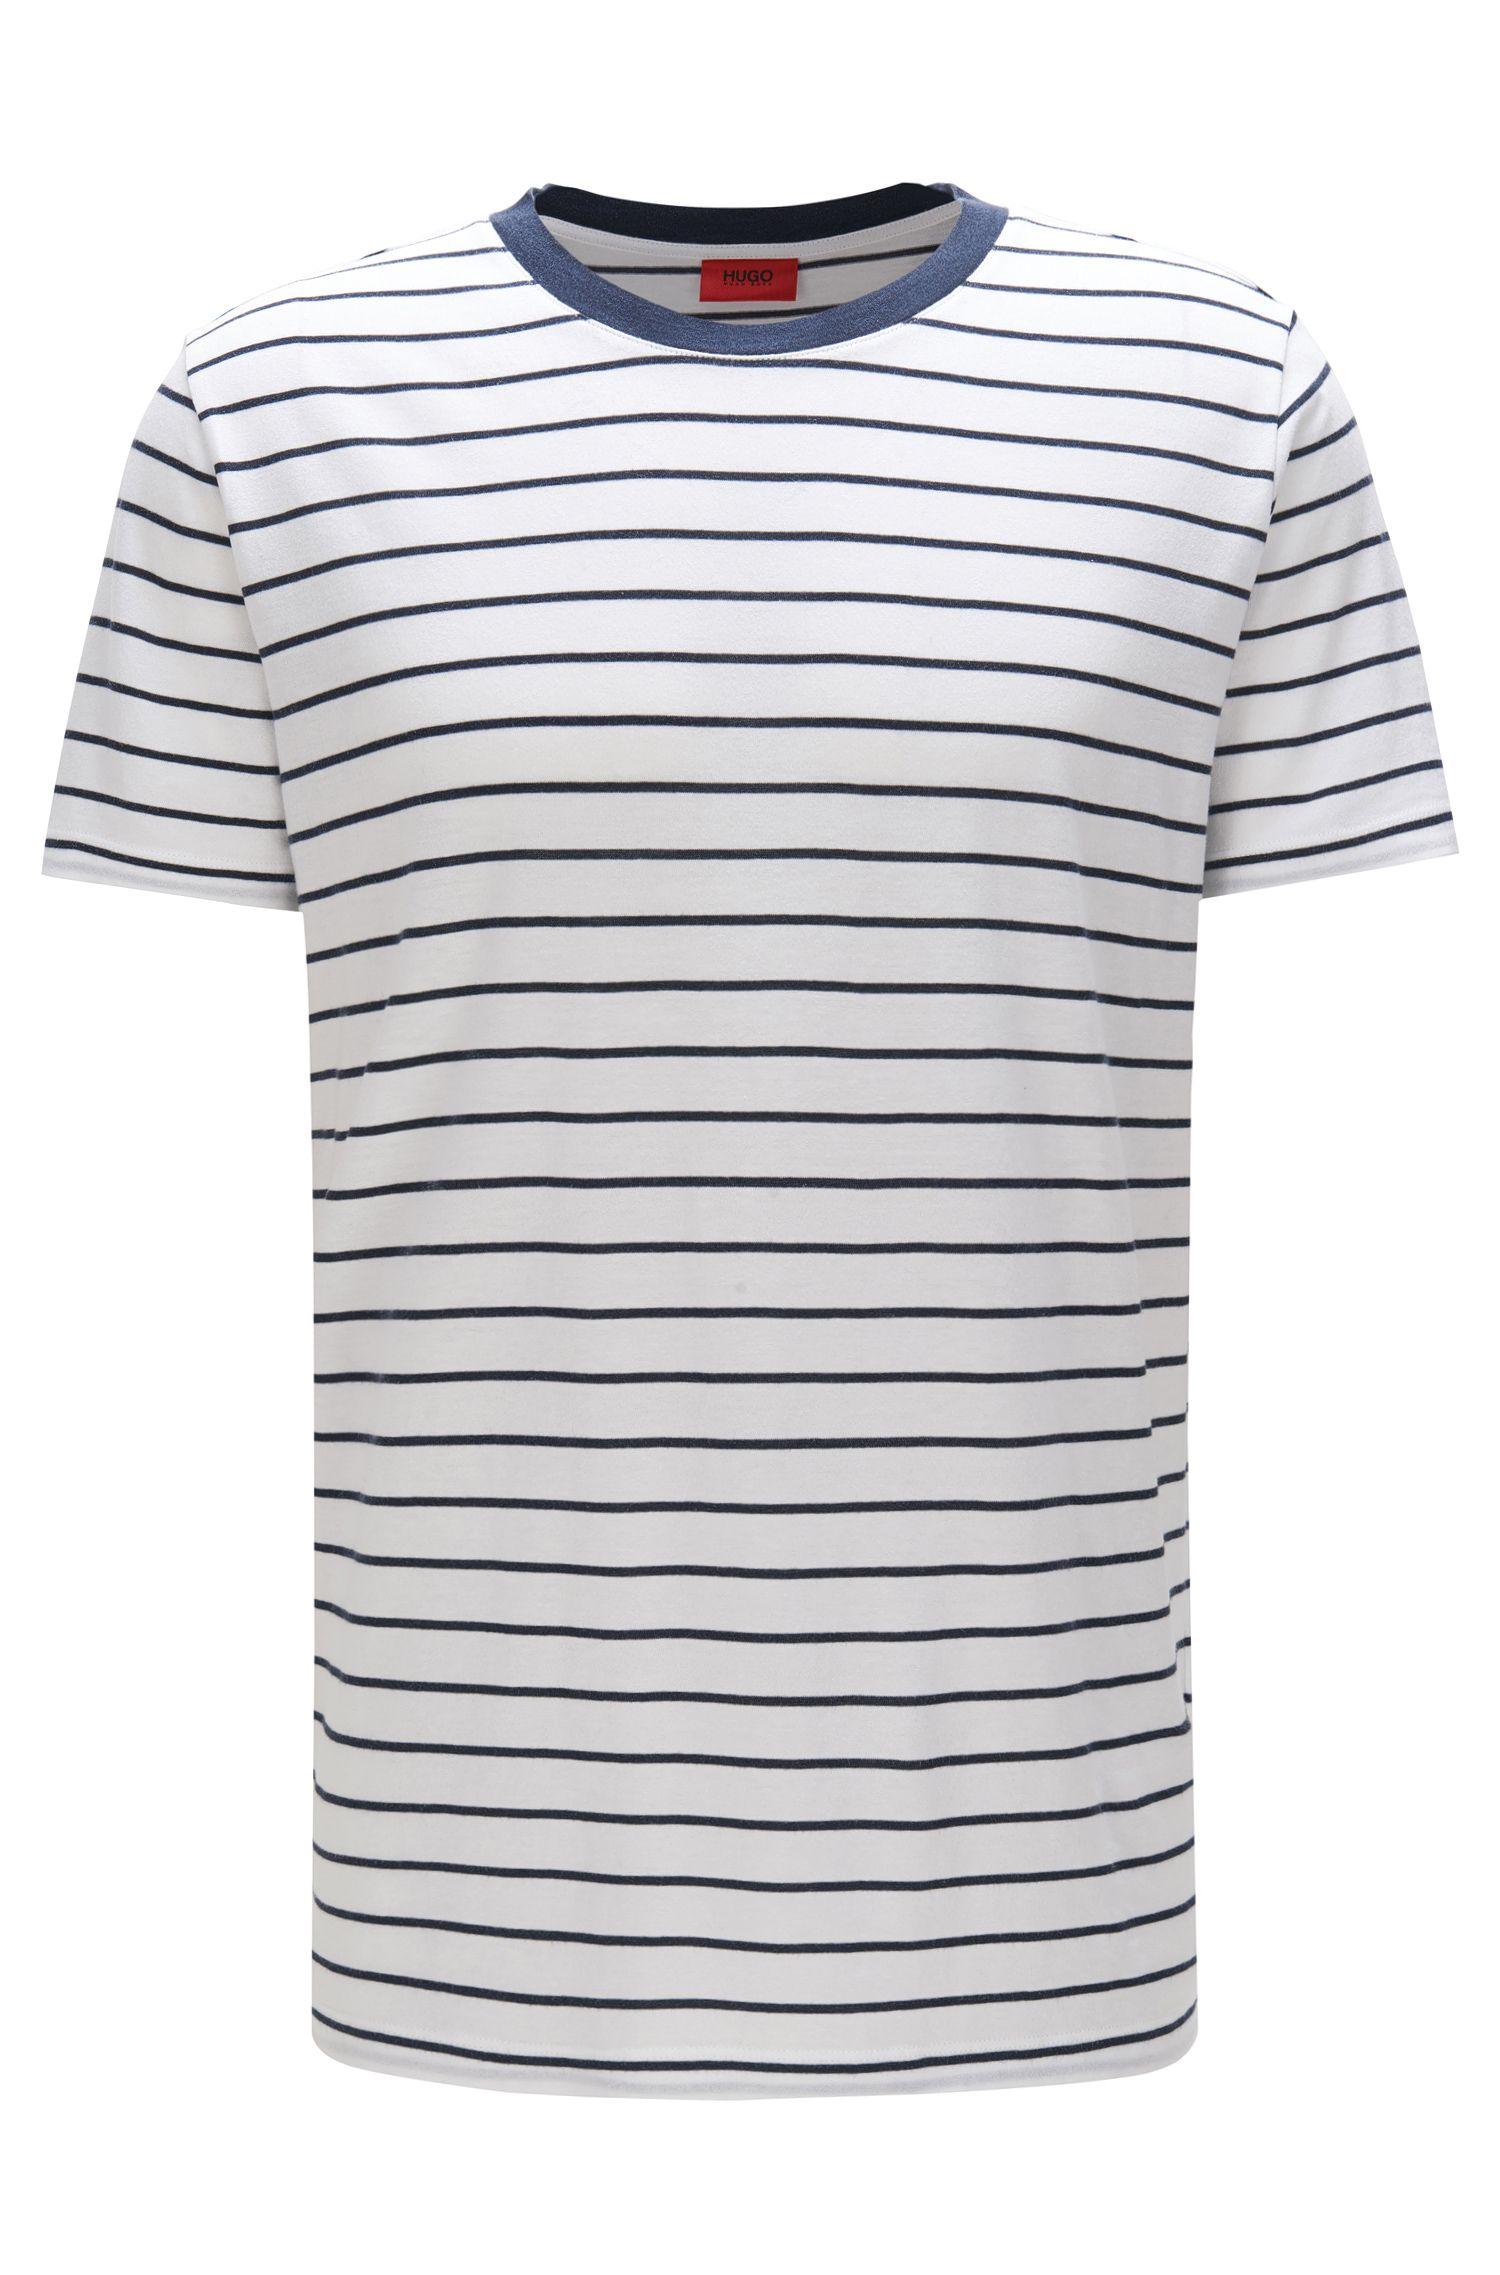 Gestreiftes Relaxed-Fit T-Shirt aus Material-Mix mit Baumwolle: 'Drimble'